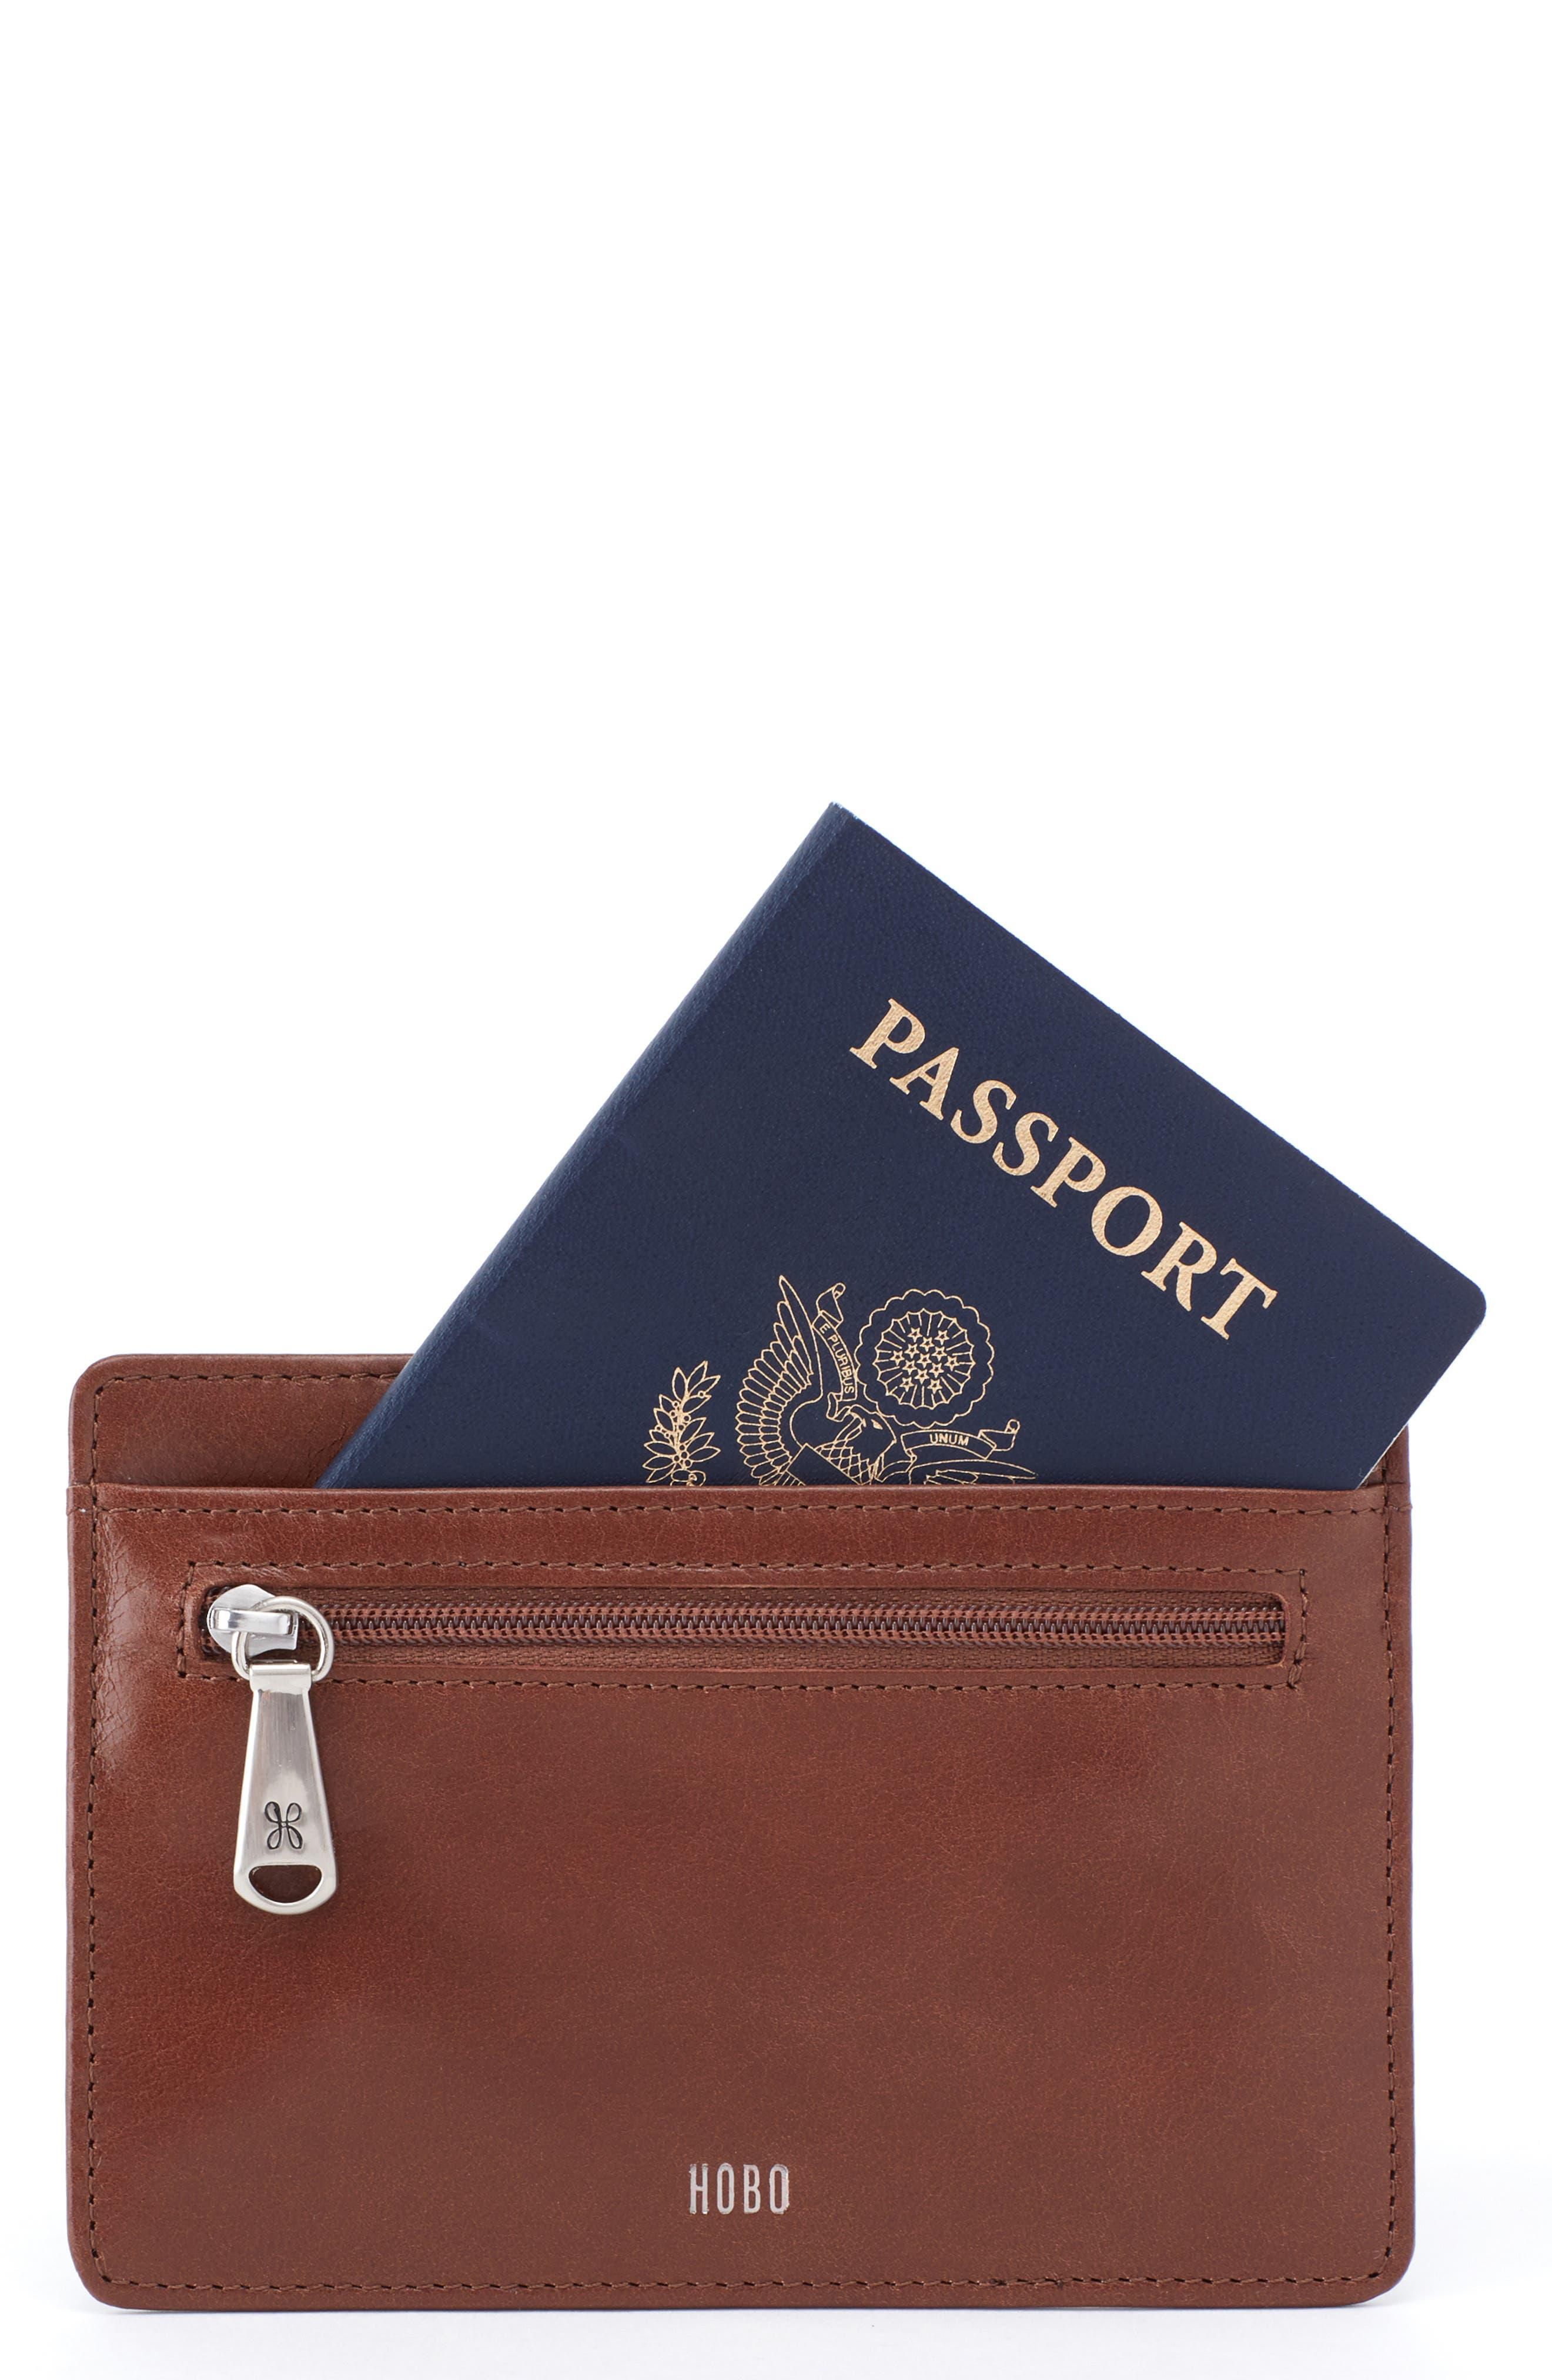 16c522e14 Travel Accessories  Passport Holders   More